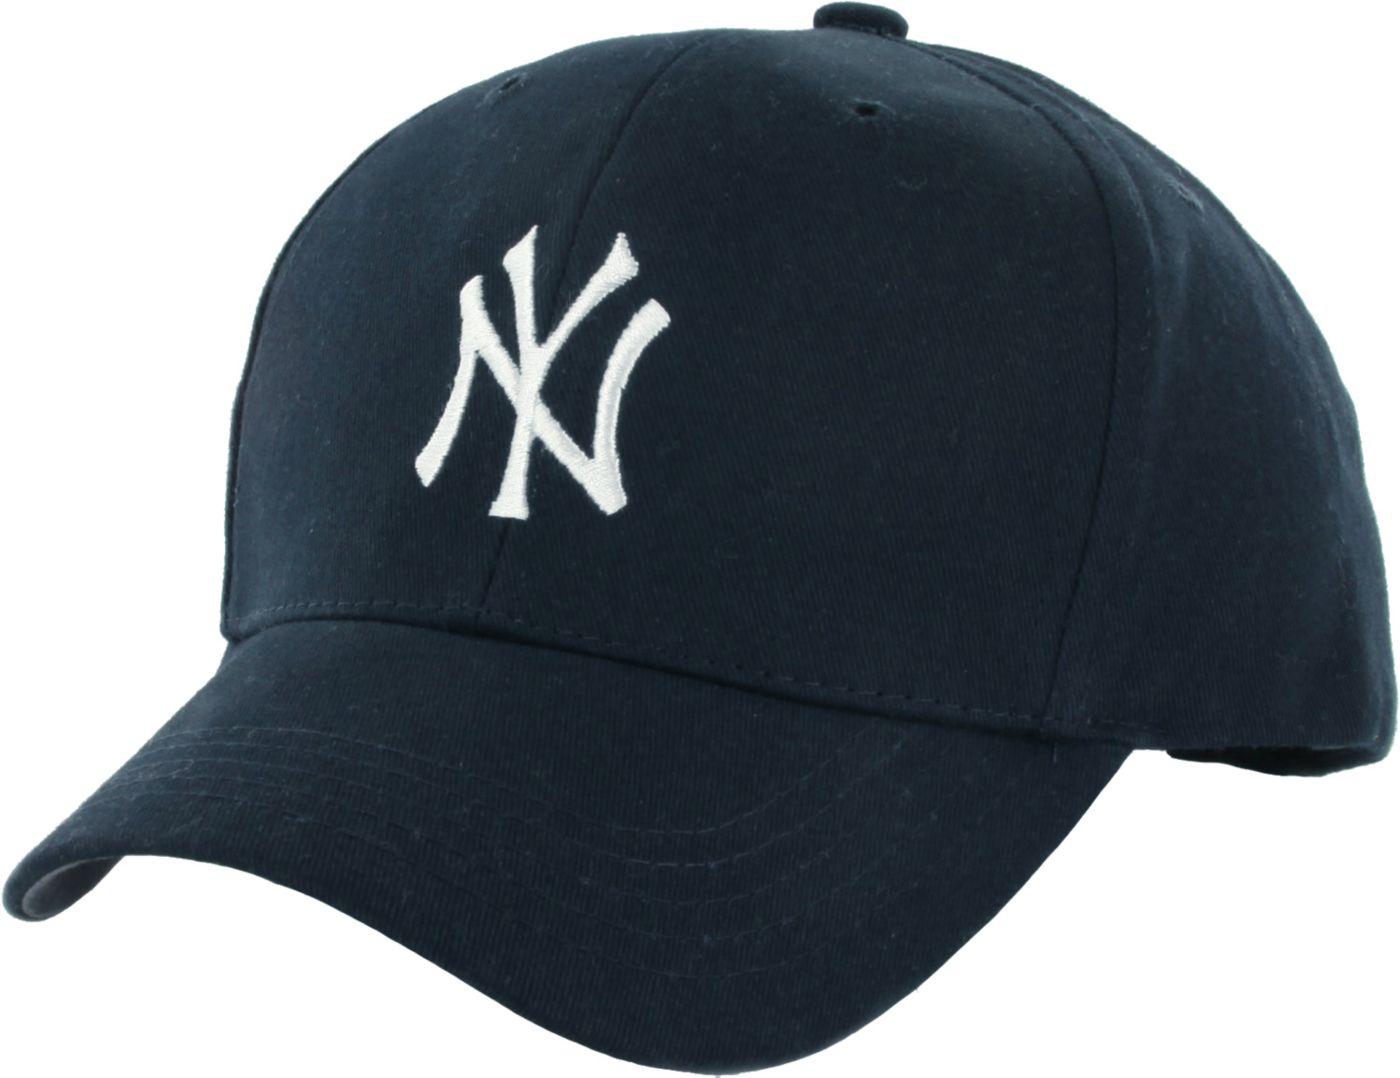 '47 Youth New York Yankees Basic Navy Adjustable Hat